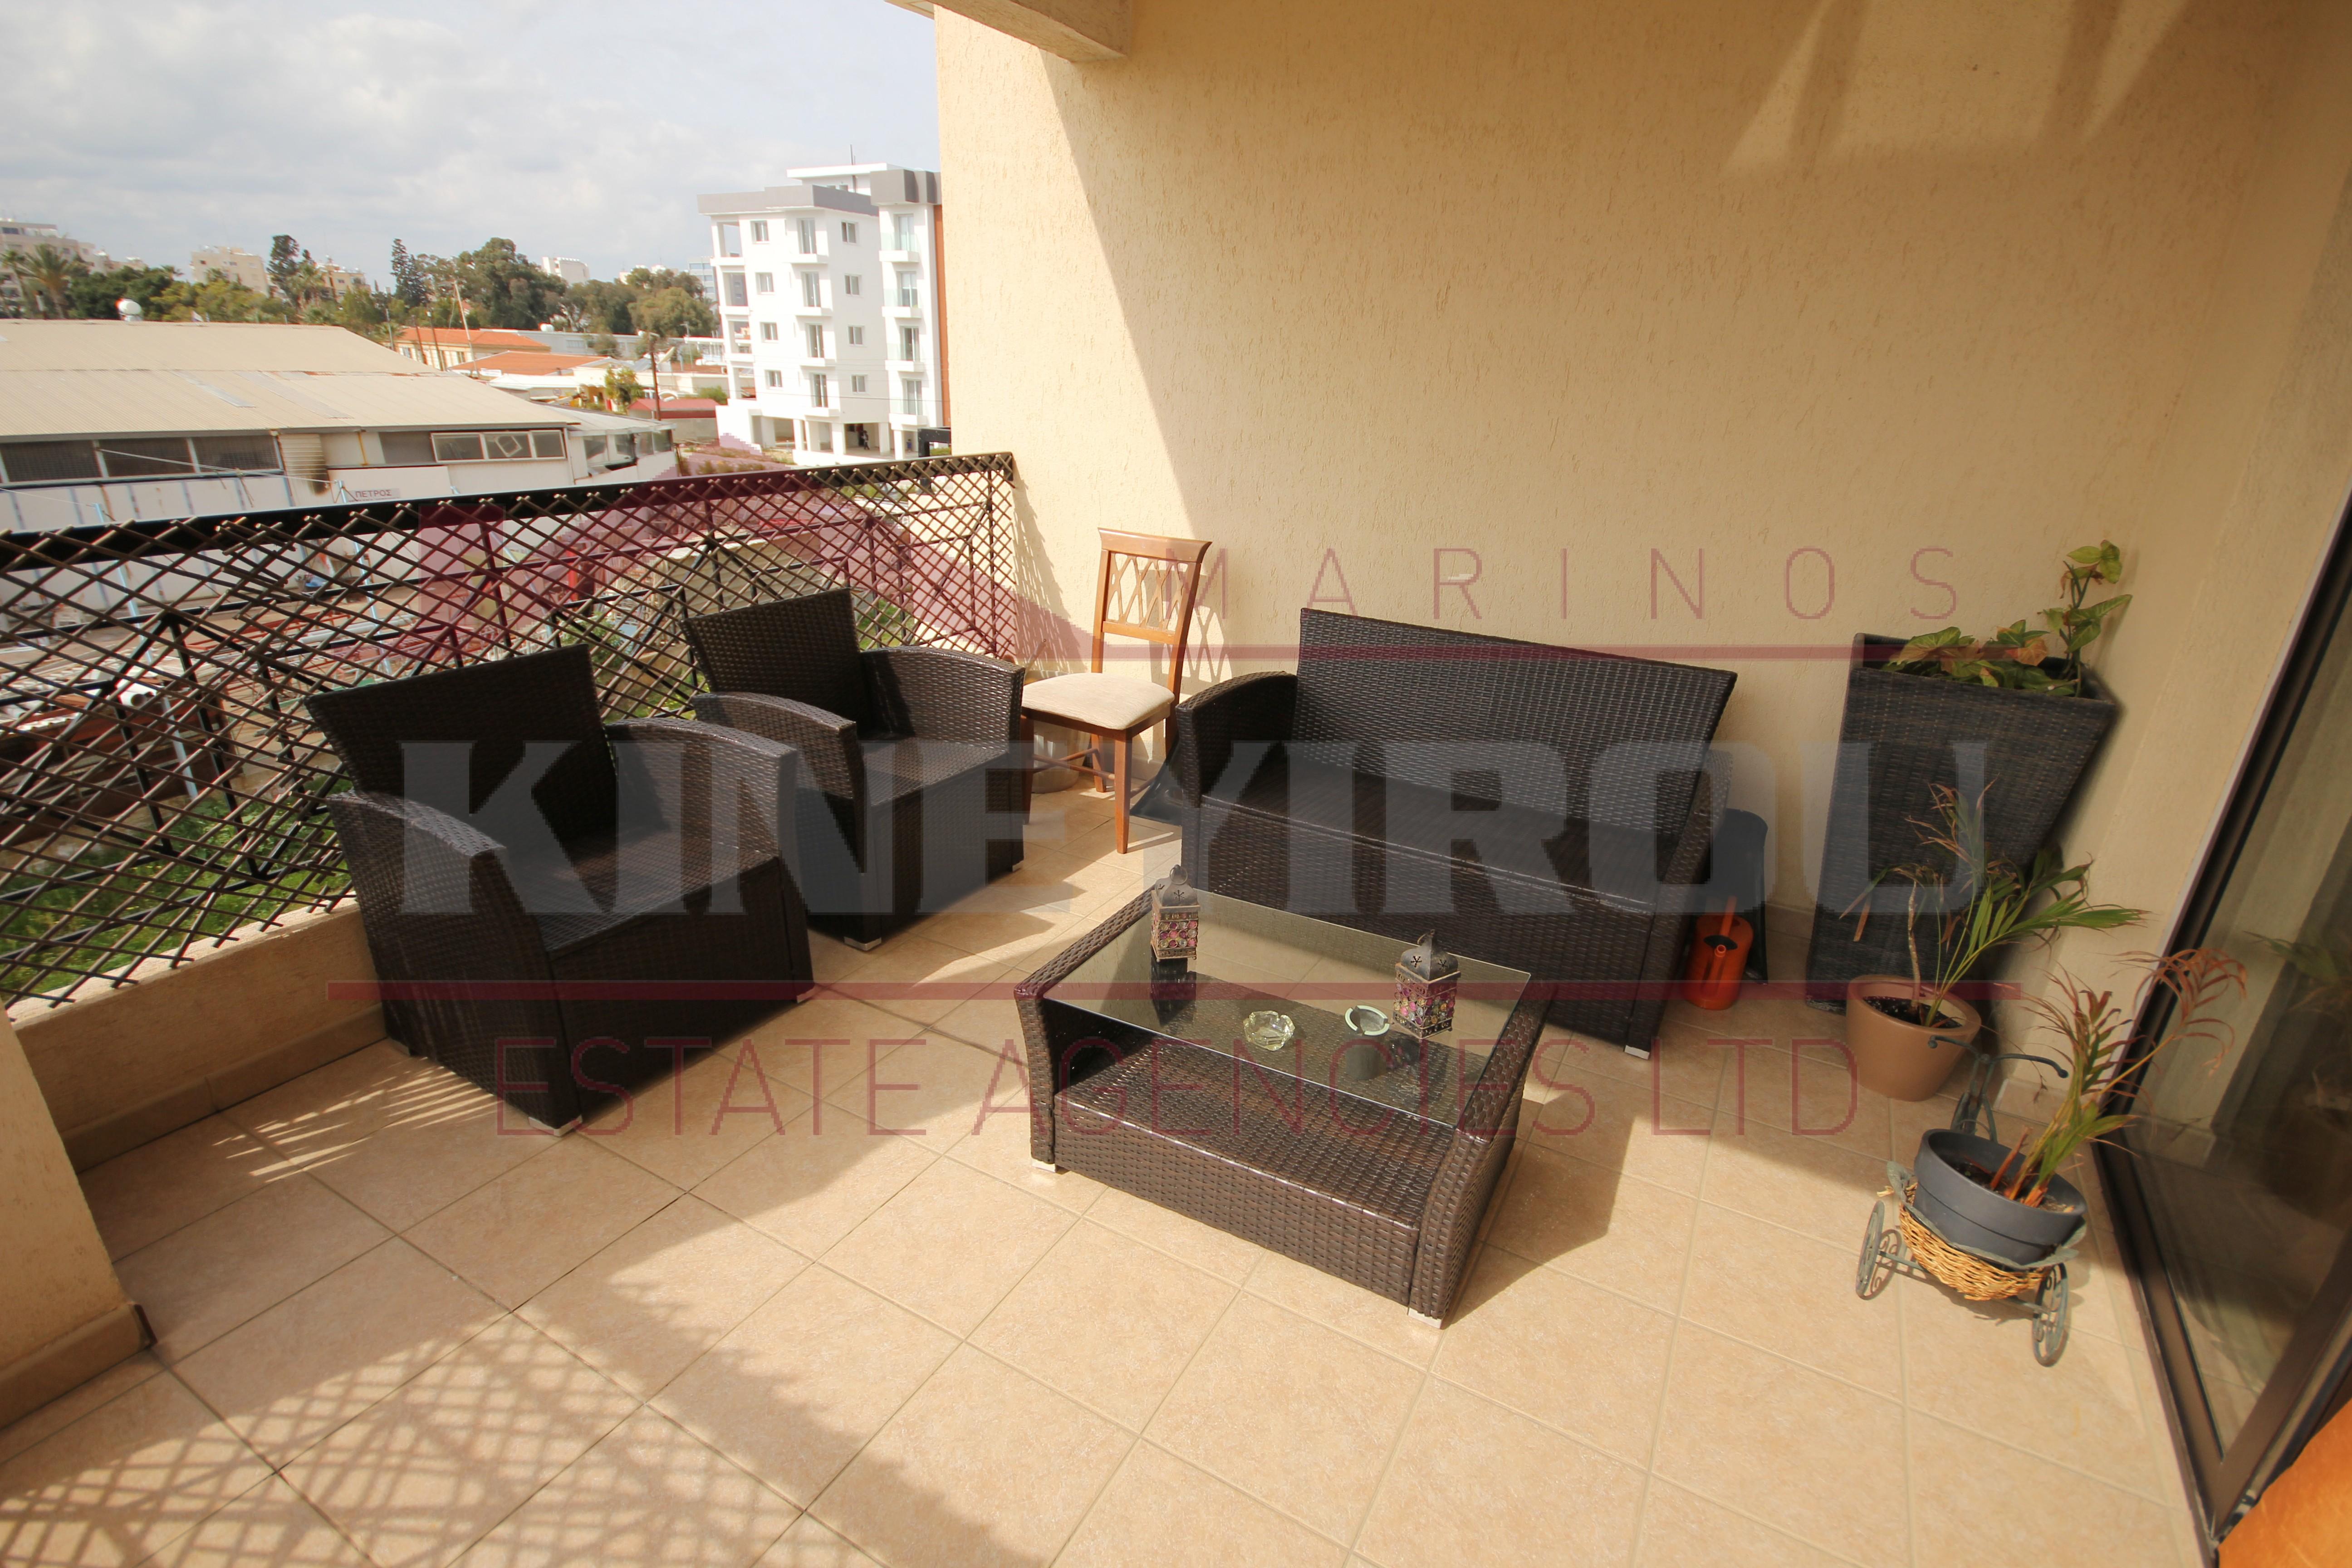 2 bedroom apartment  in town center , Larnaca